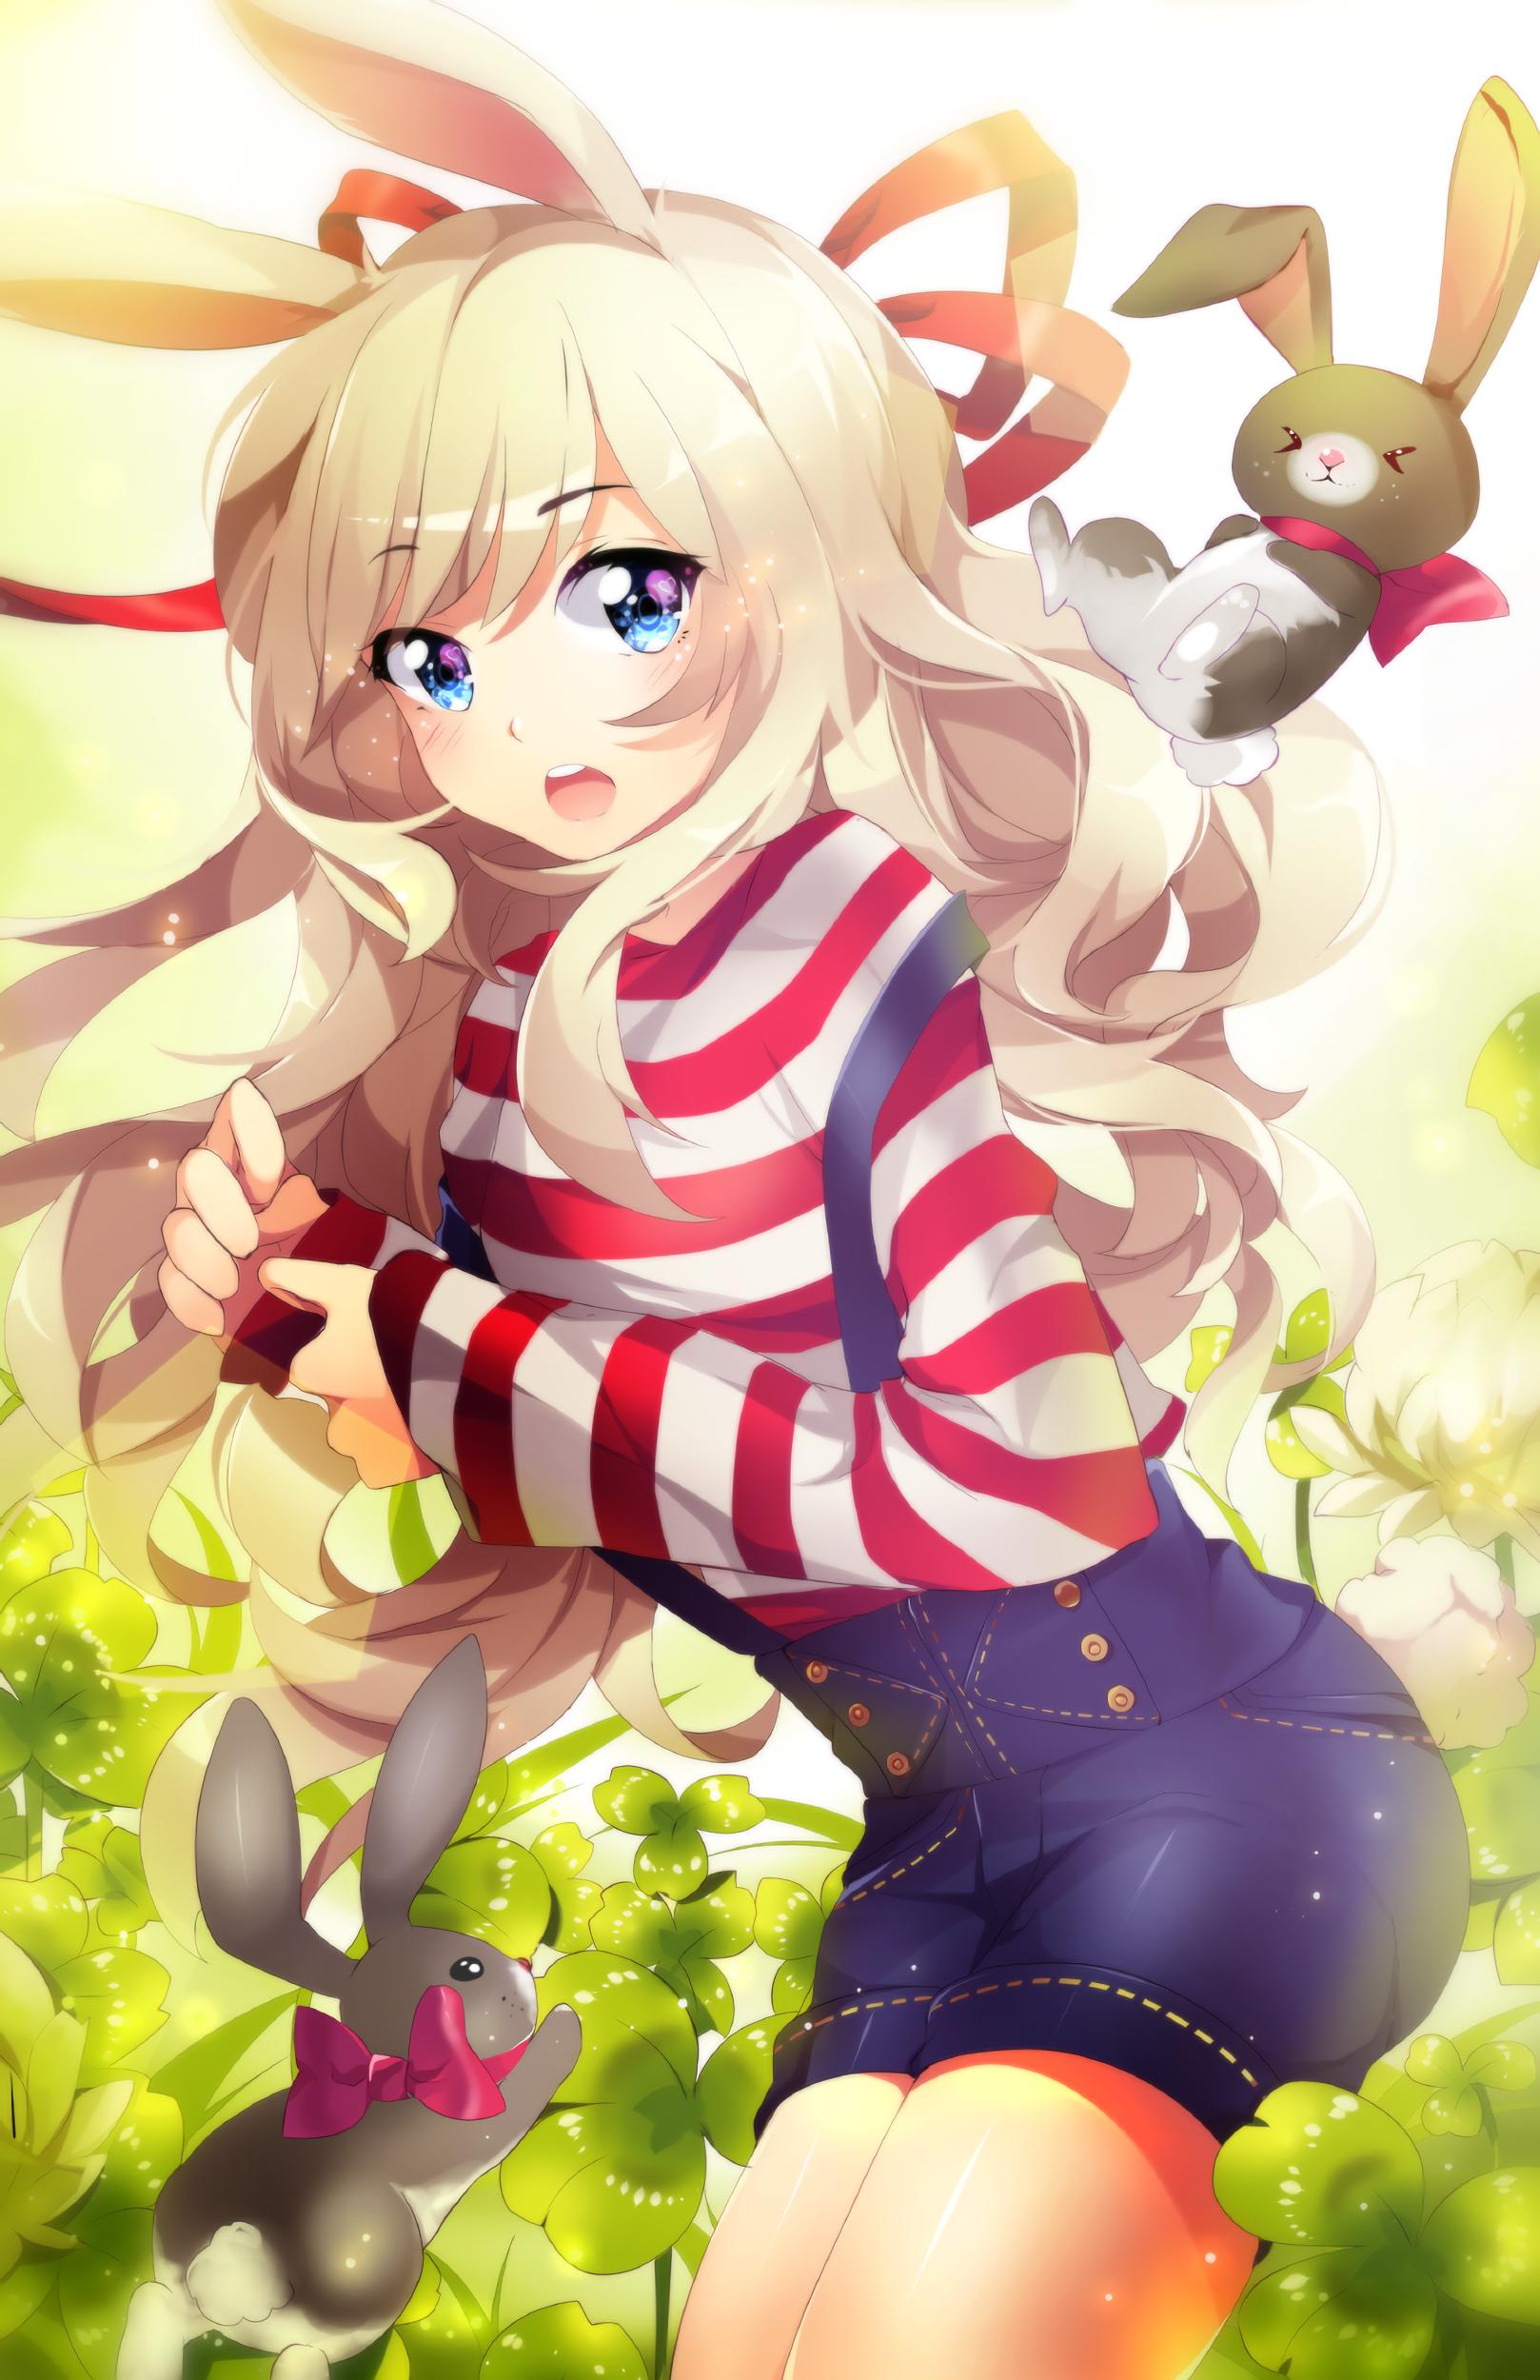 Anime 1618x2500 anime anime girls shorts rabbits long hair blonde blue eyes bunny ears